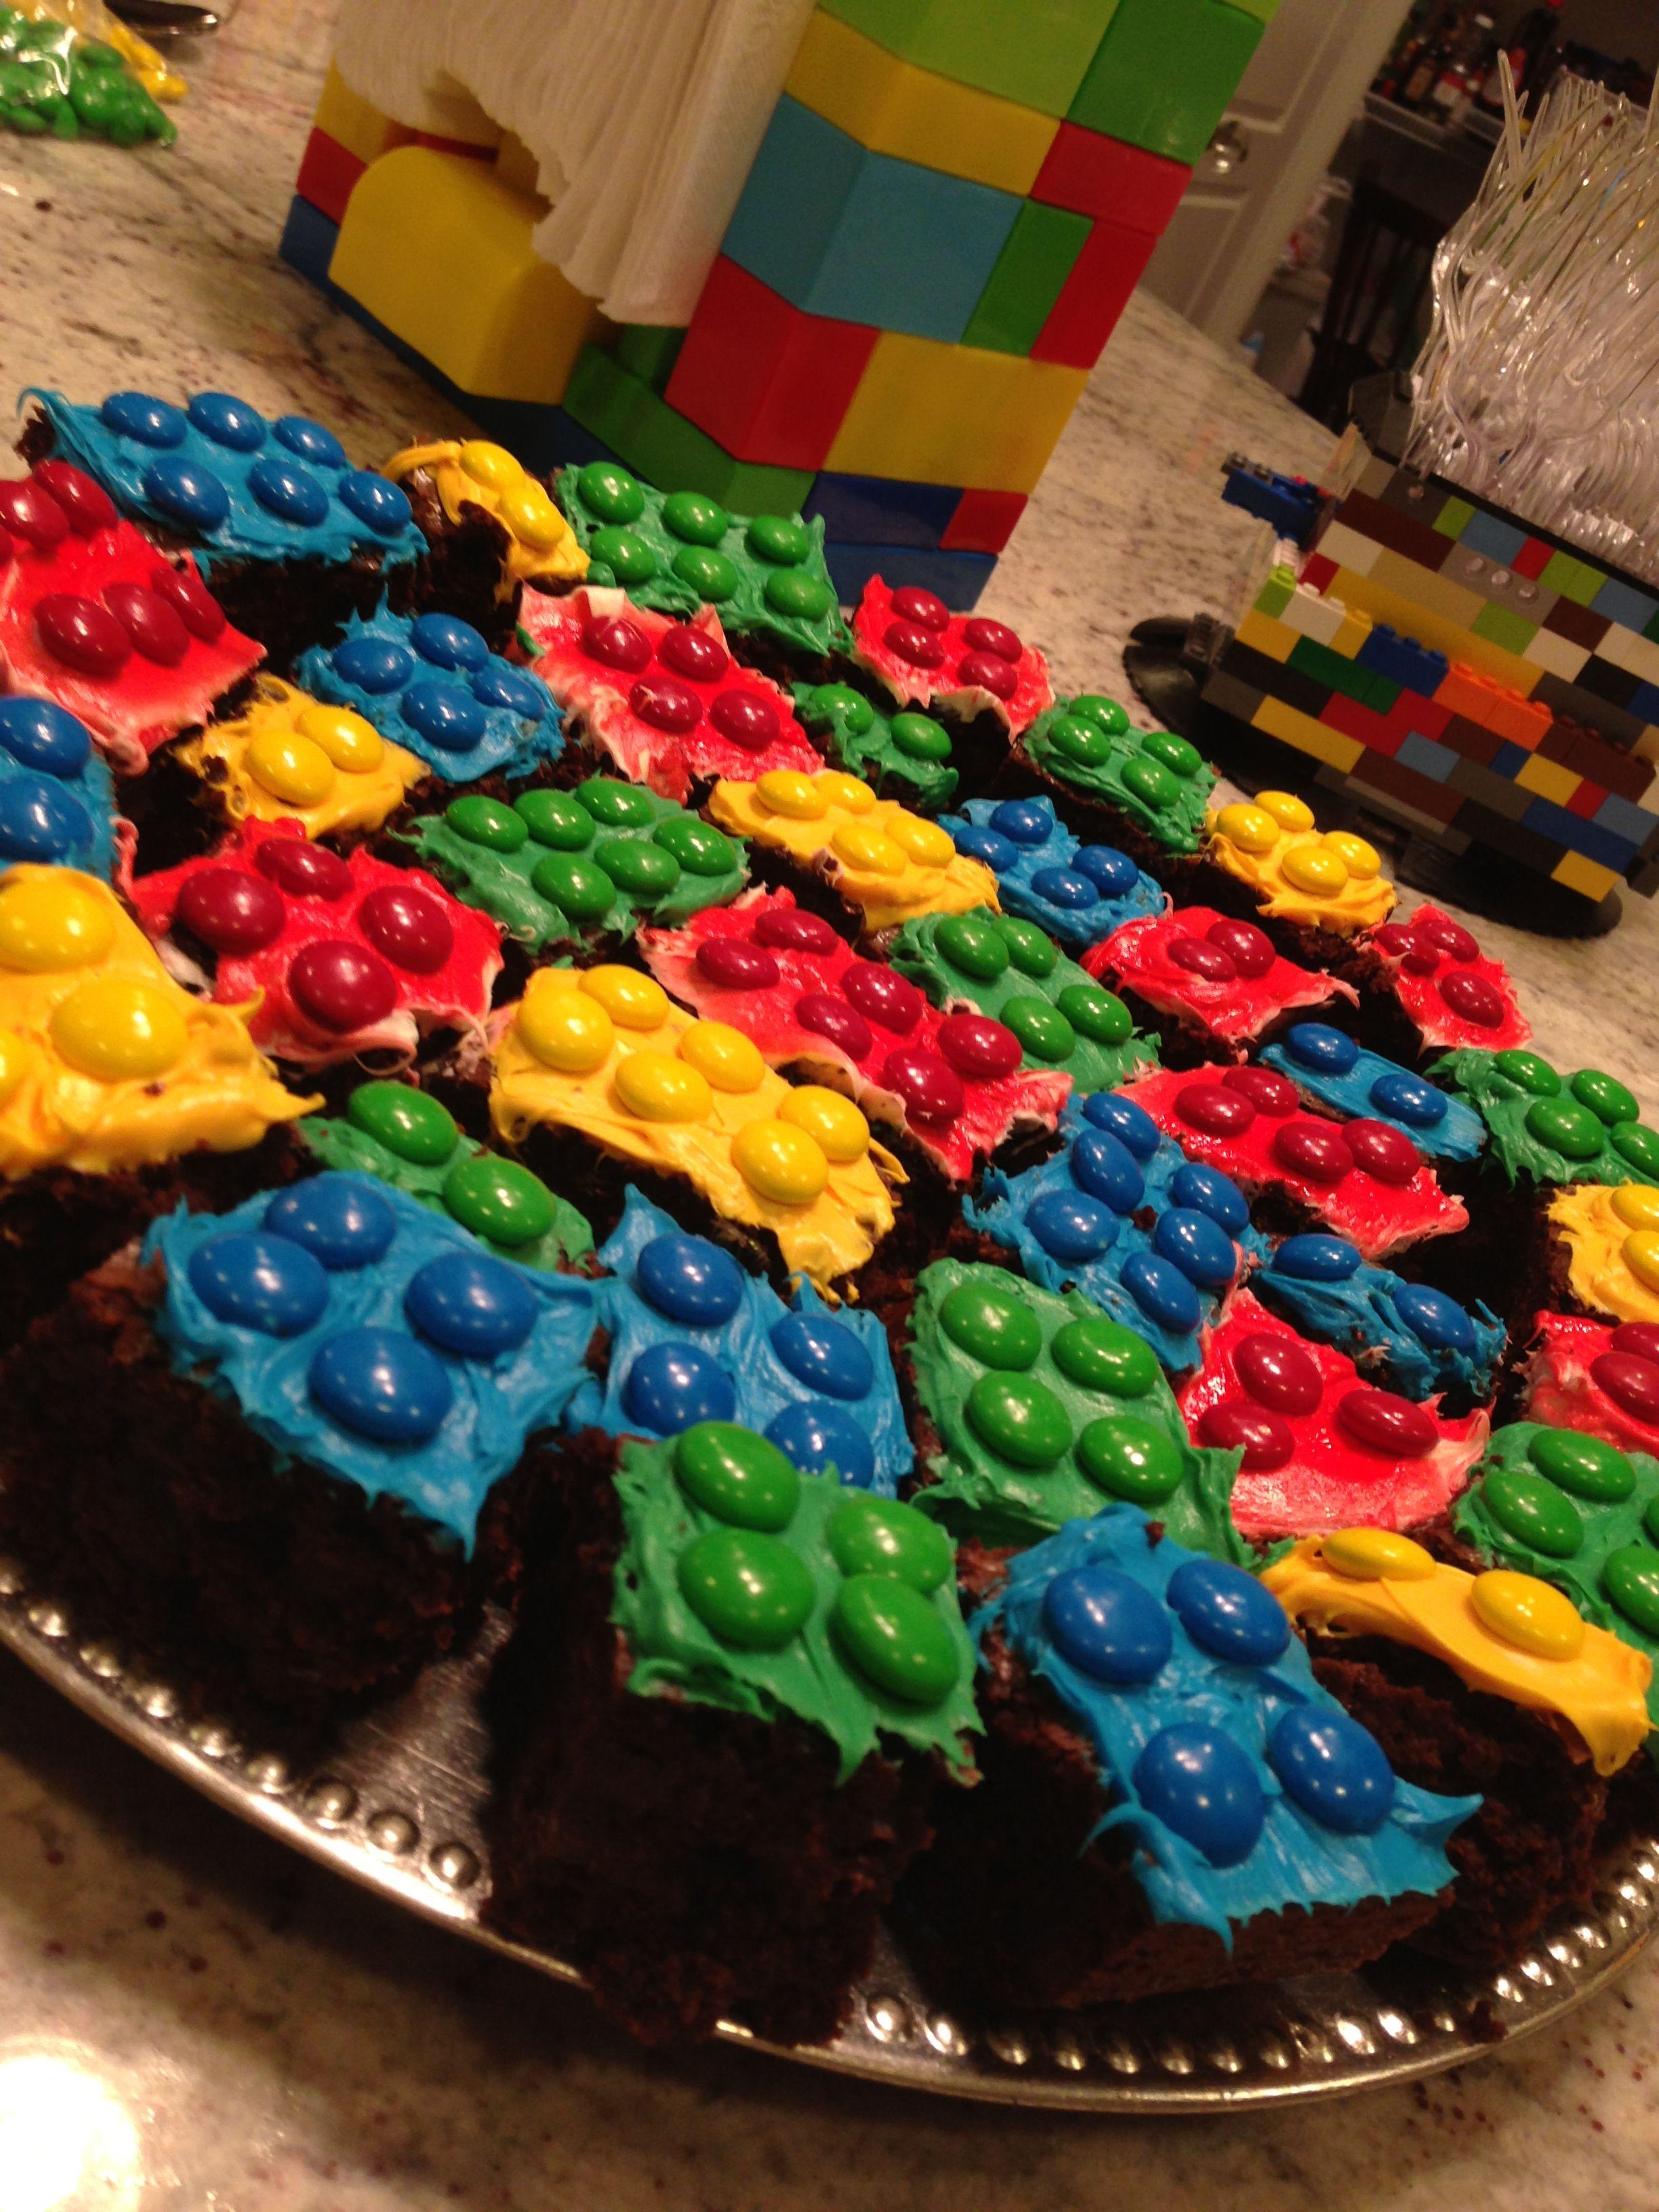 Pin By Katerina Anast On Kid Stuff Lego Birthday Party Lego Birthday Lego Party